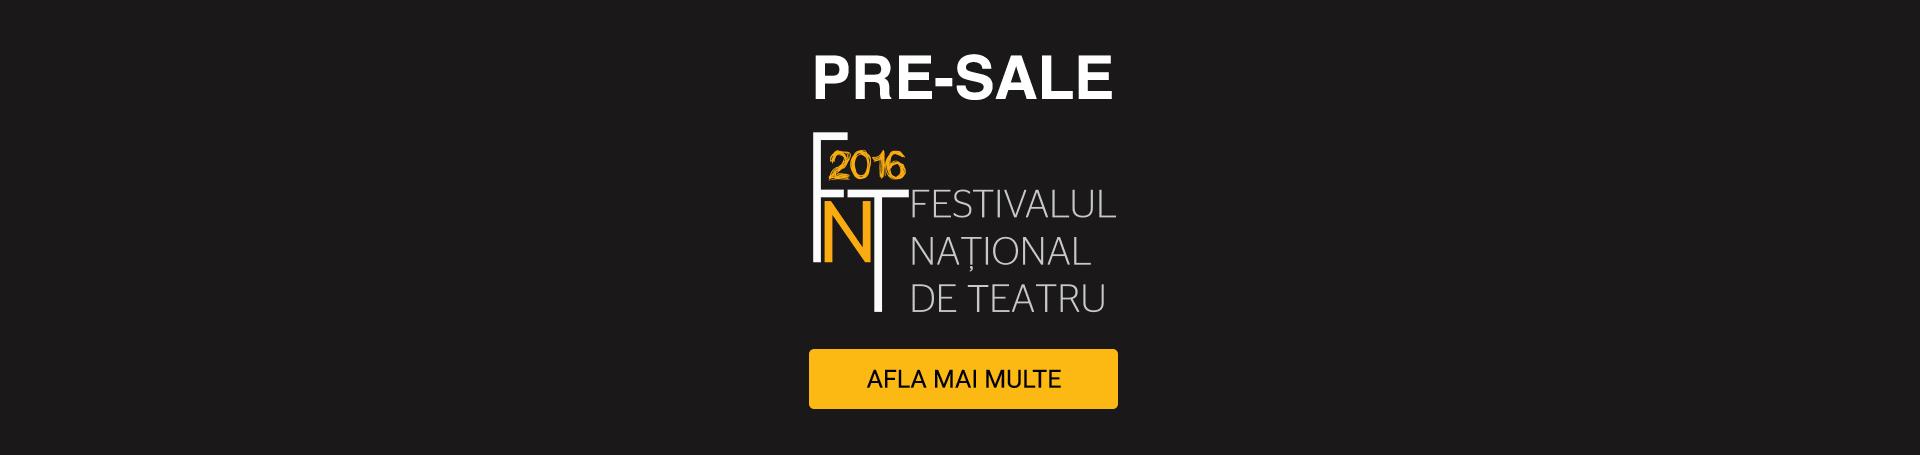 Presale FNT 2016